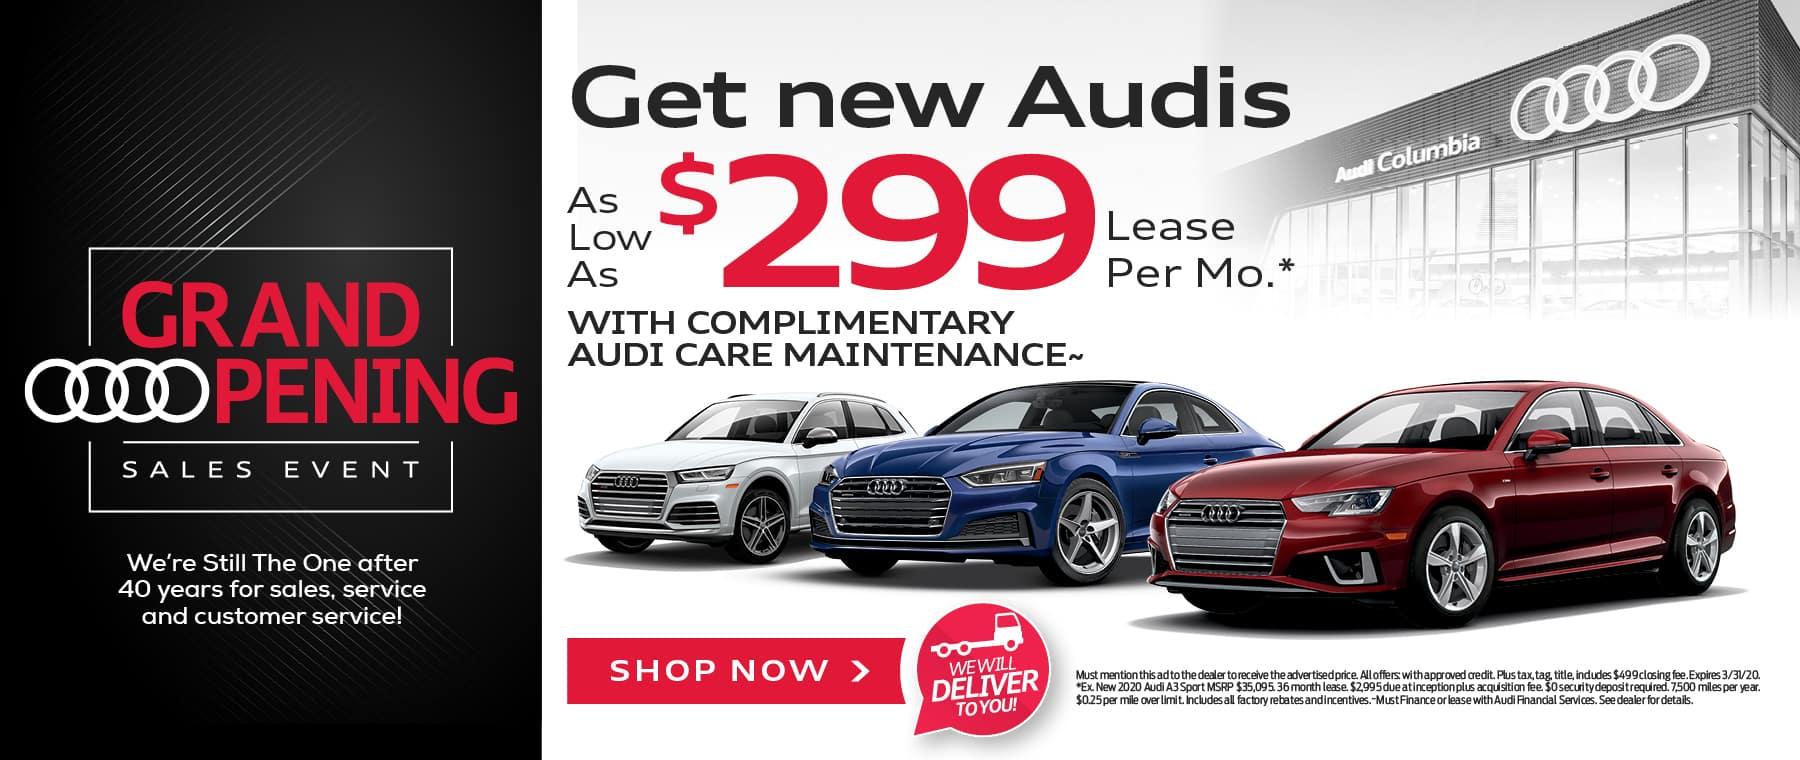 Get New Audis